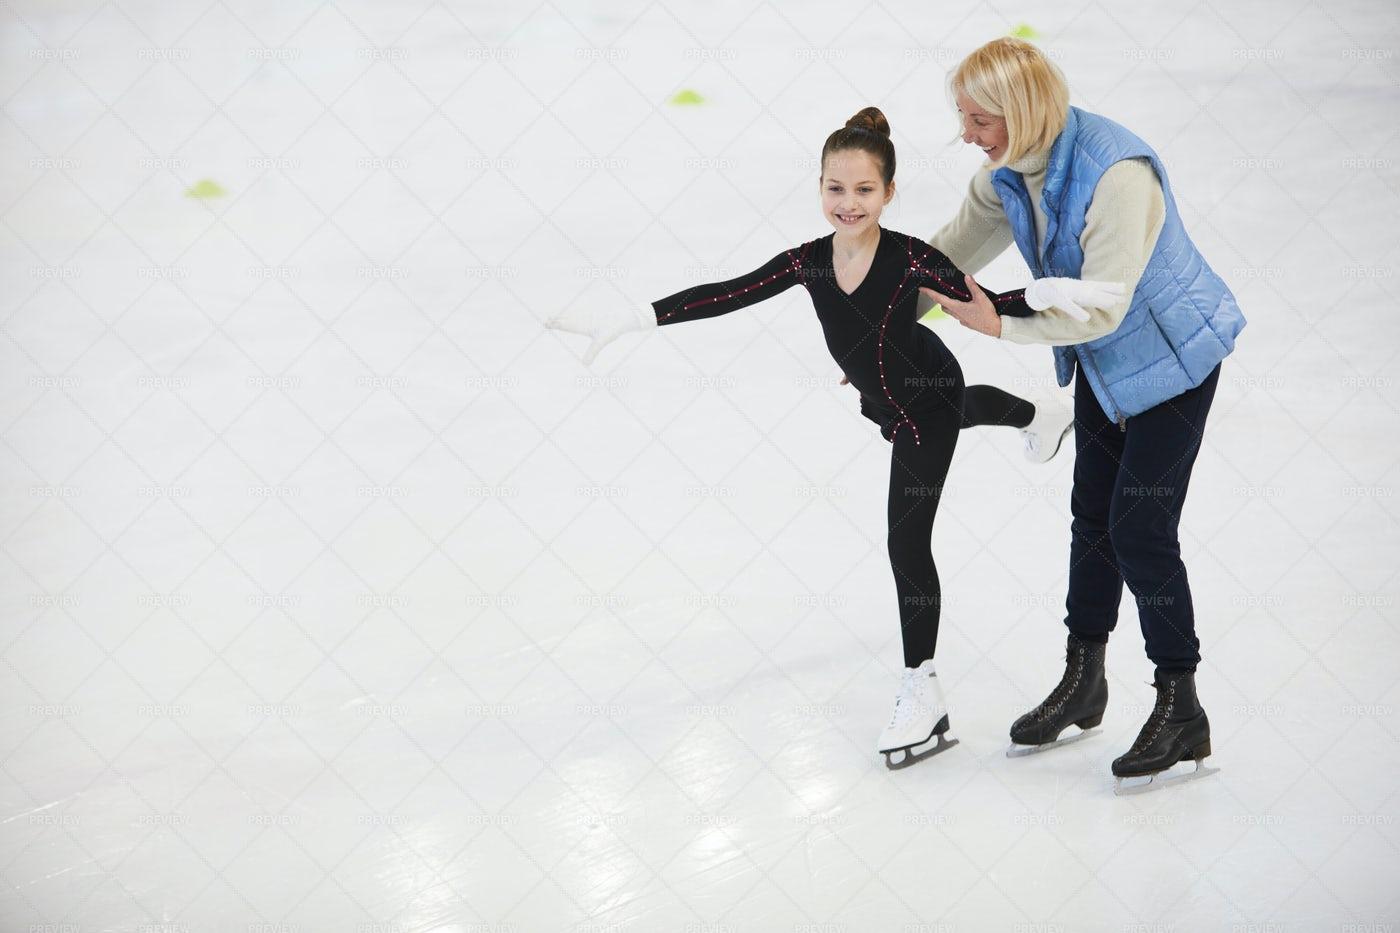 Coach Helping Girl Figure Skating: Stock Photos